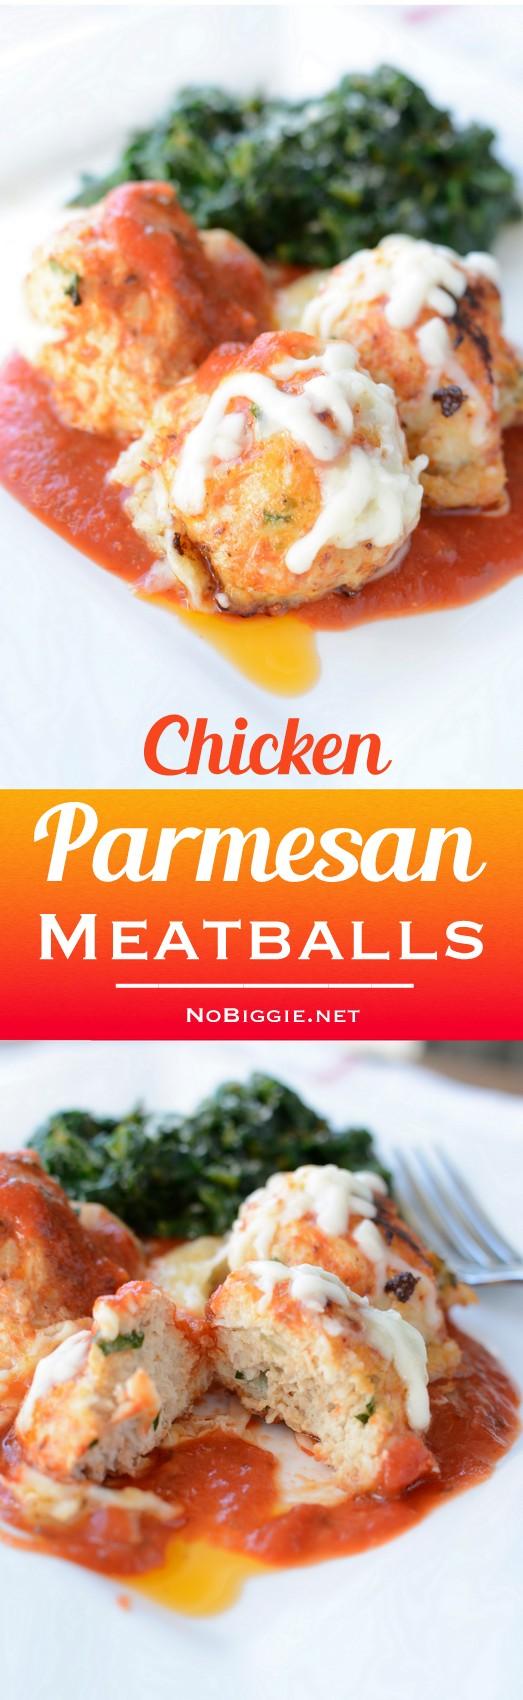 http://www.nobiggie.net/wp-content/uploads/2016/03/chicken-parmesan-meatballs.jpg